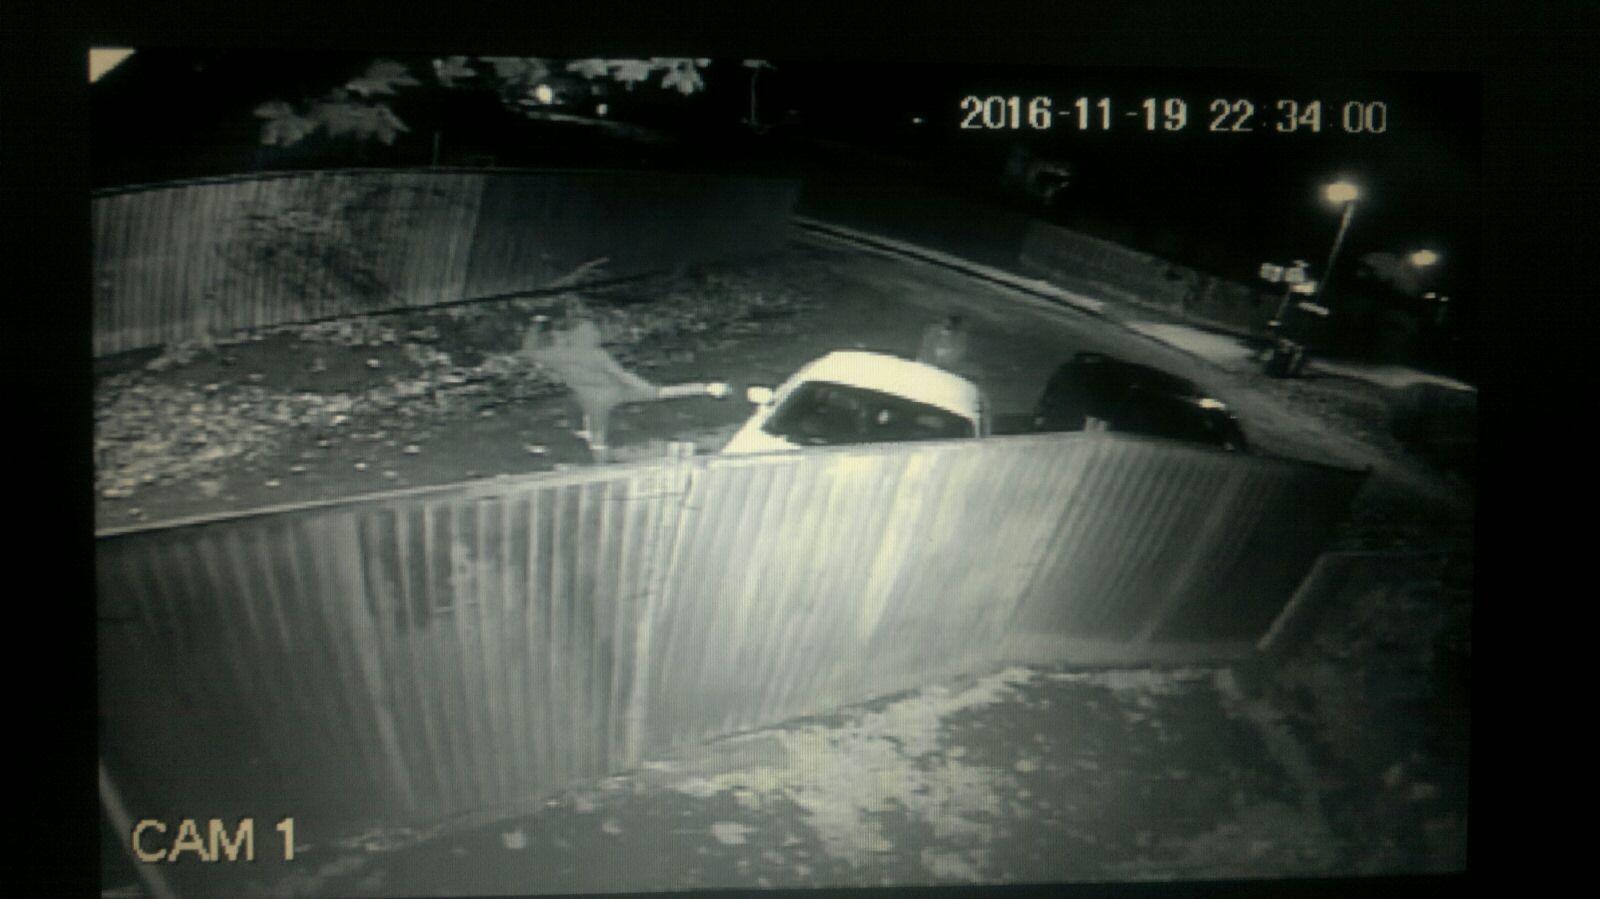 CCTV footage of people at the caravan owner's cars at 10.34pm.